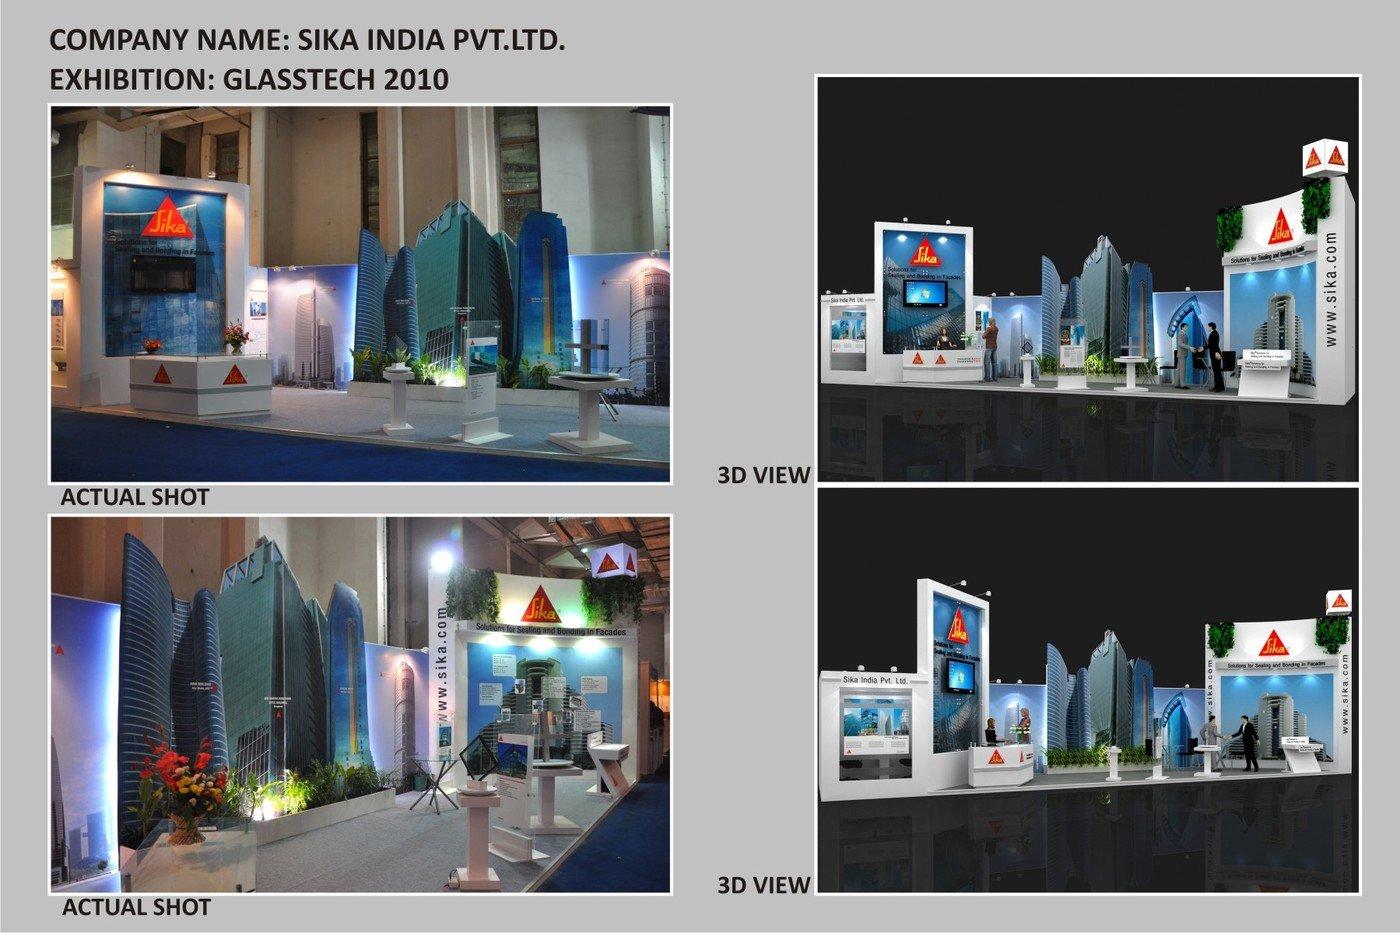 SIKA @GLASSTECH 2010 by Sameer Benkar at Coroflot com